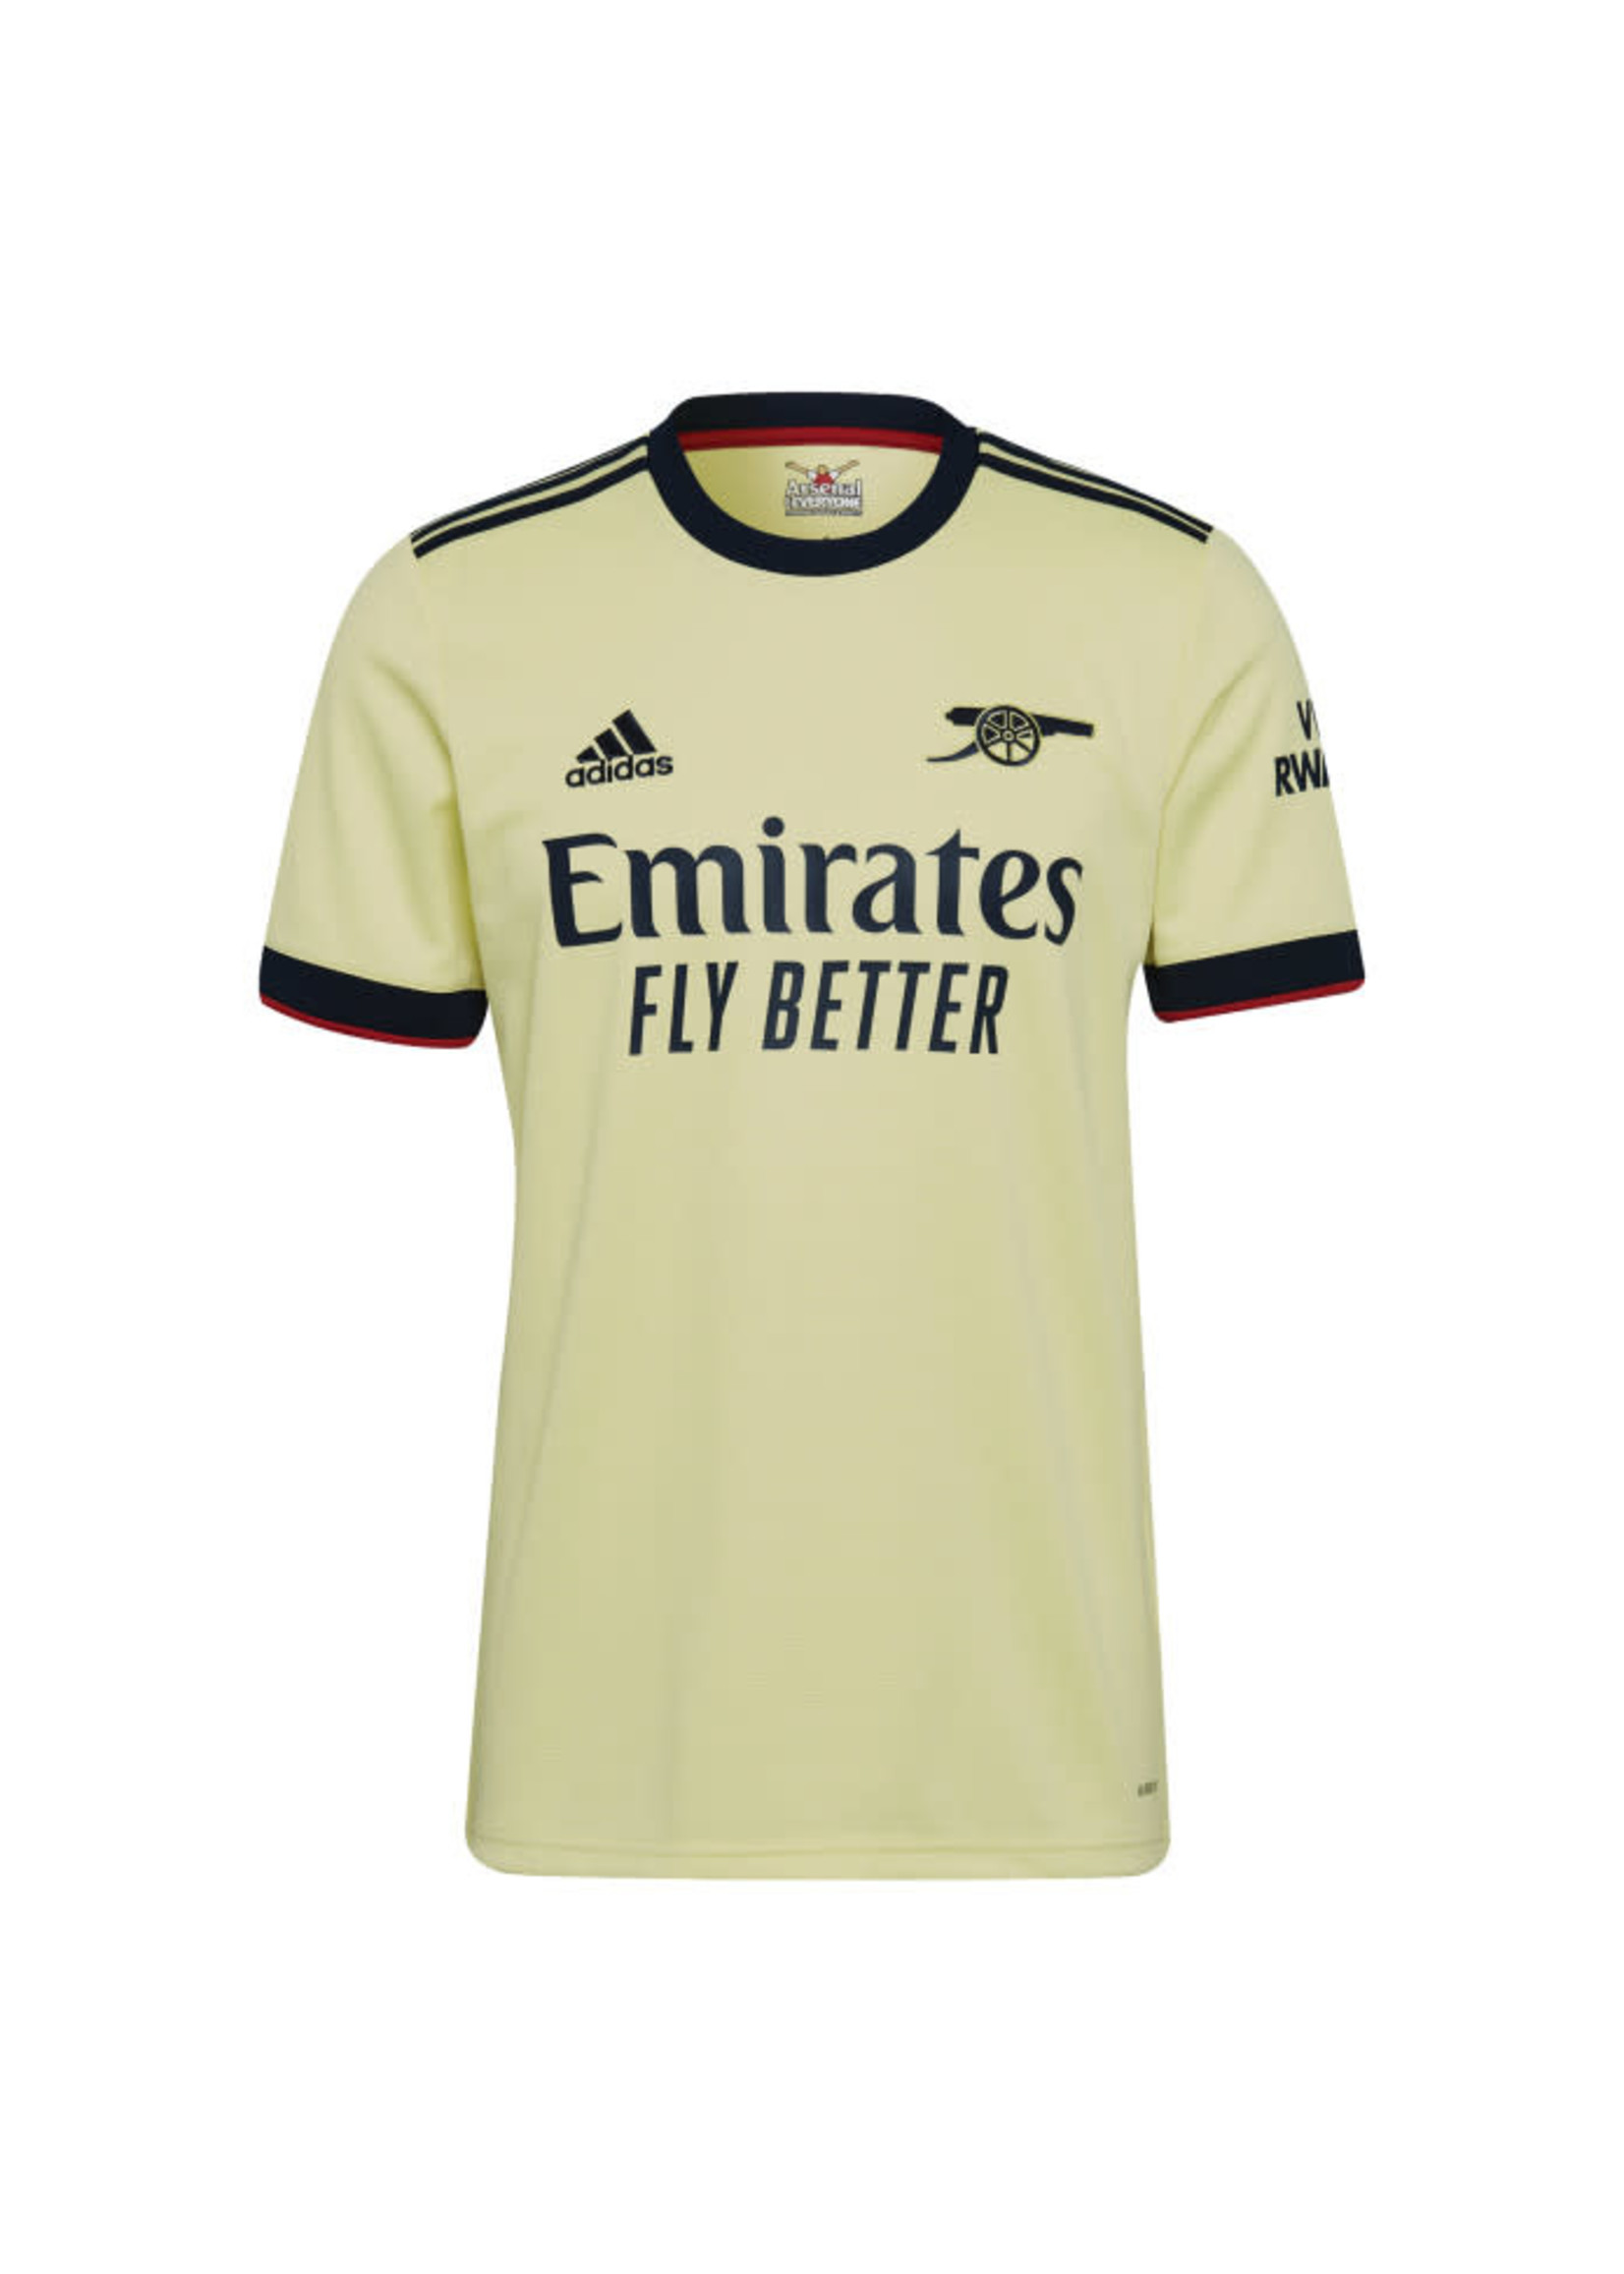 Adidas ARSENAL AWAY JERSEY 2021/22